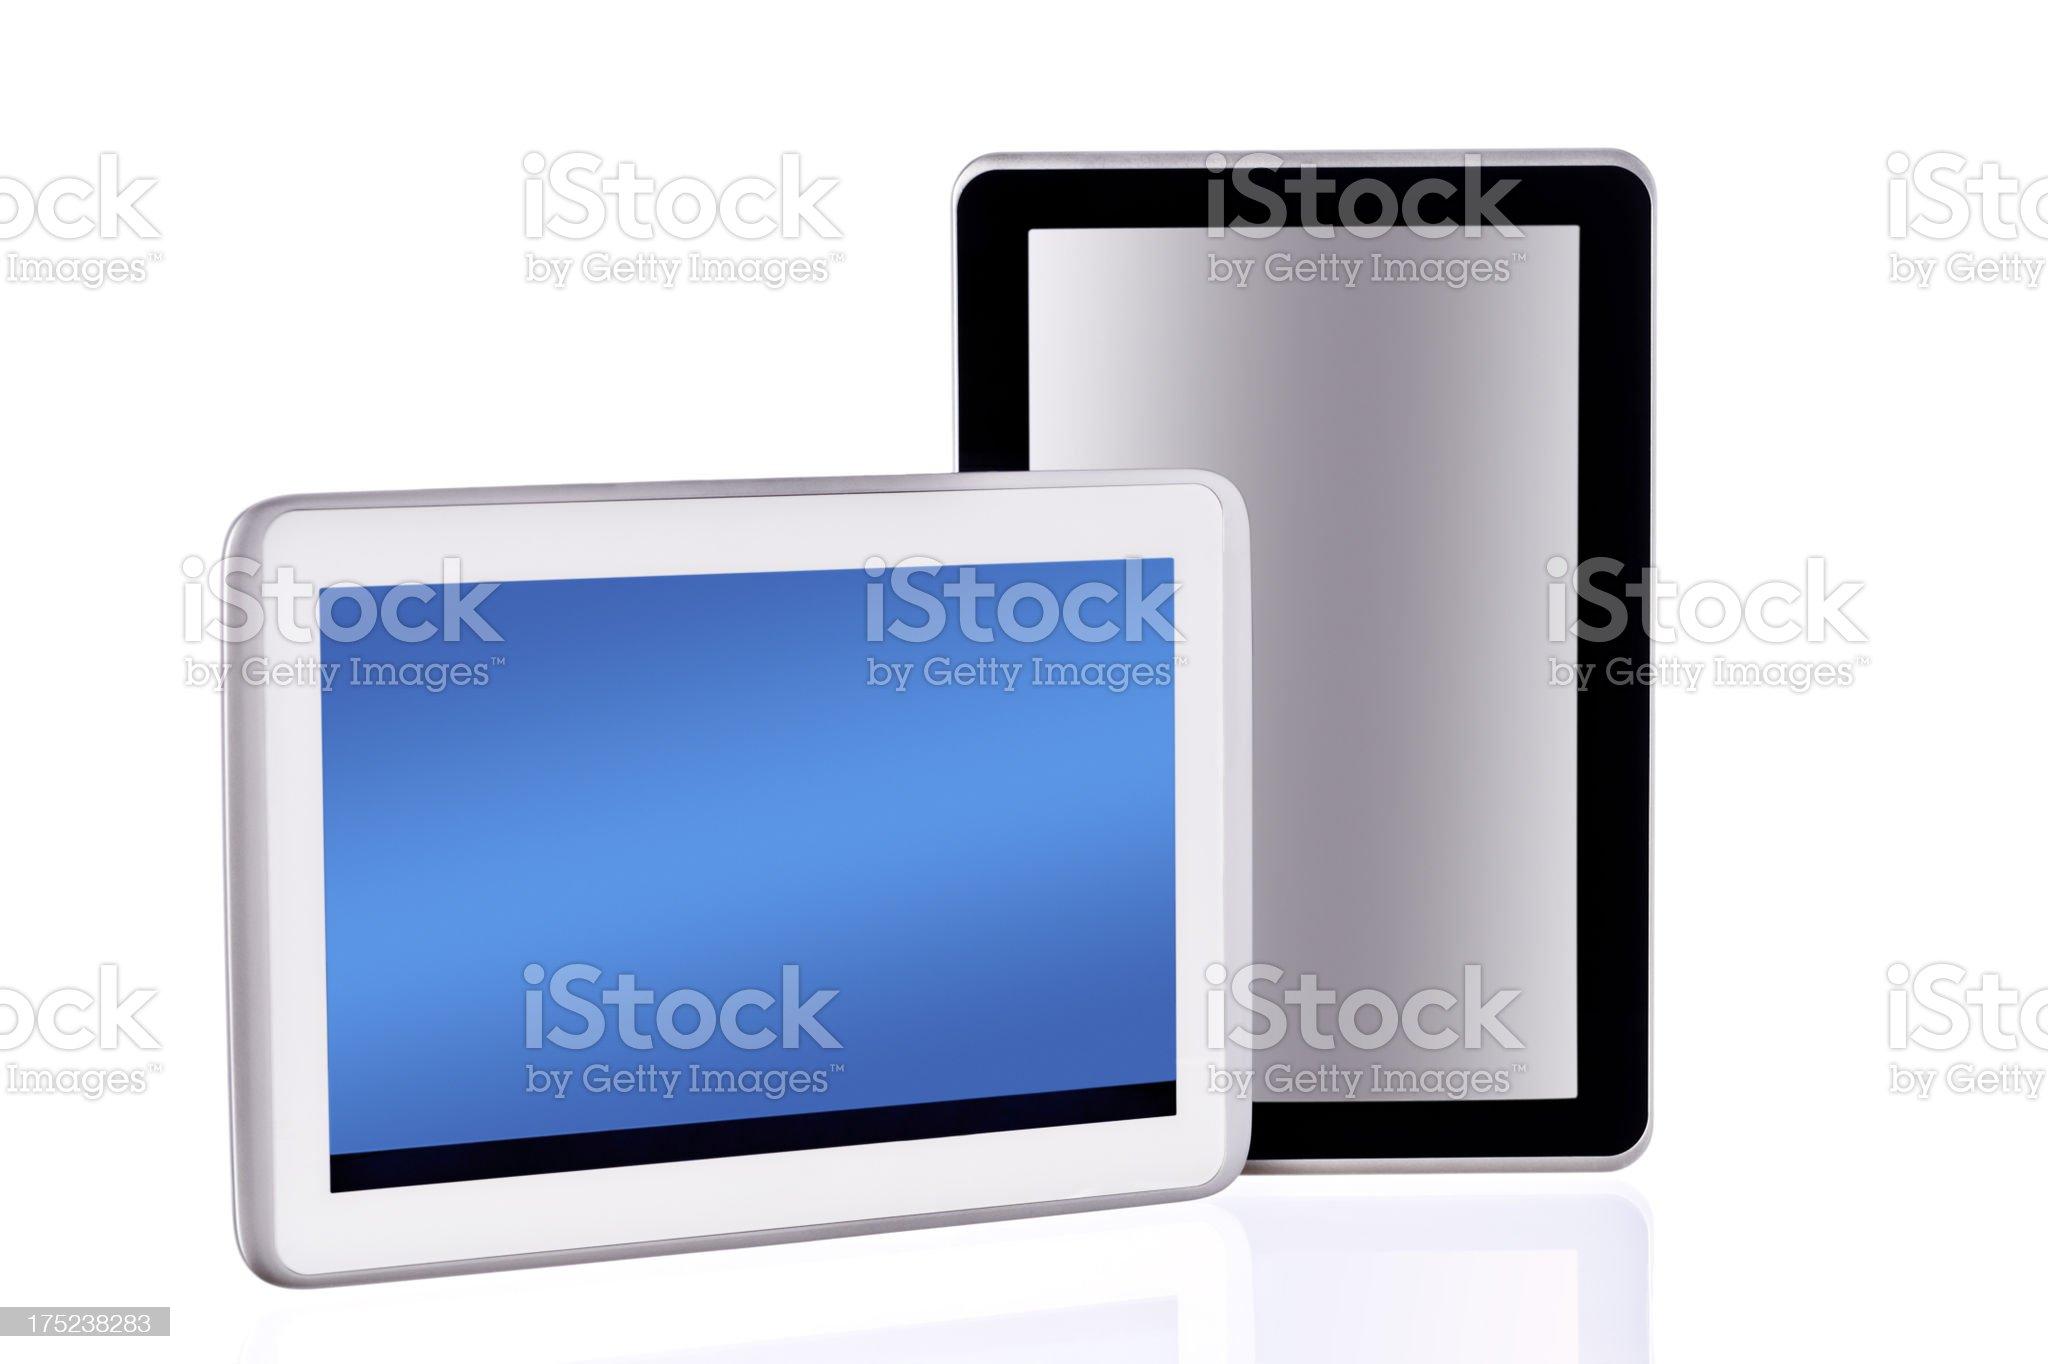 Digital tablets royalty-free stock photo